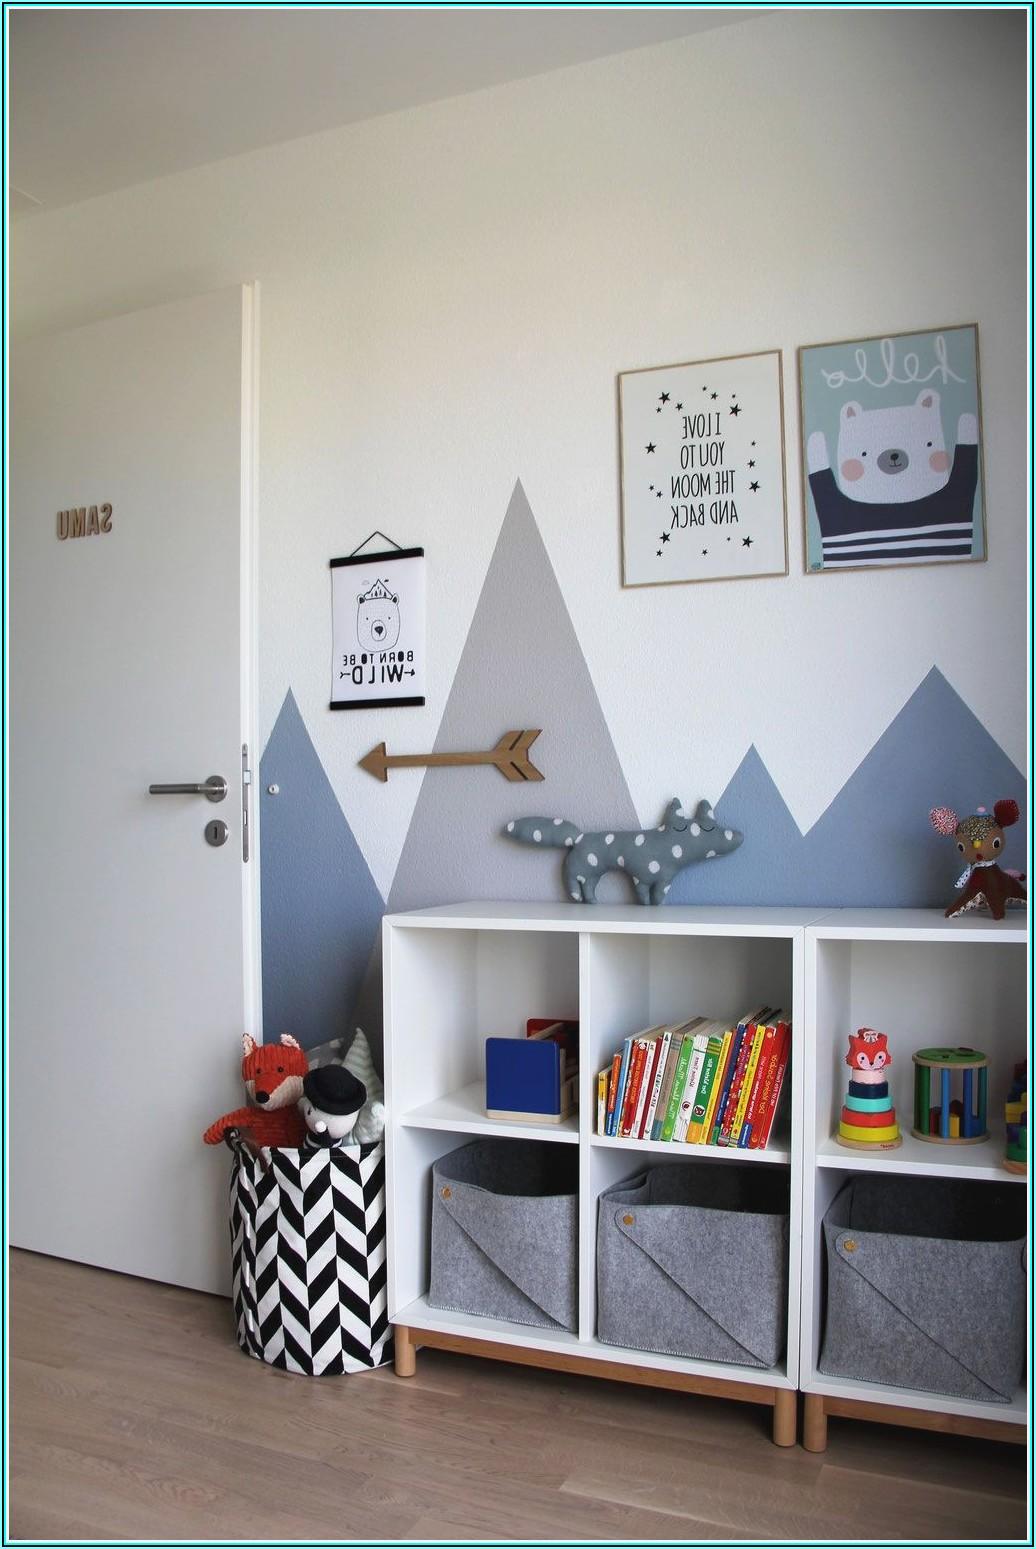 Wandgestaltung Kinderzimmer Grau Blau